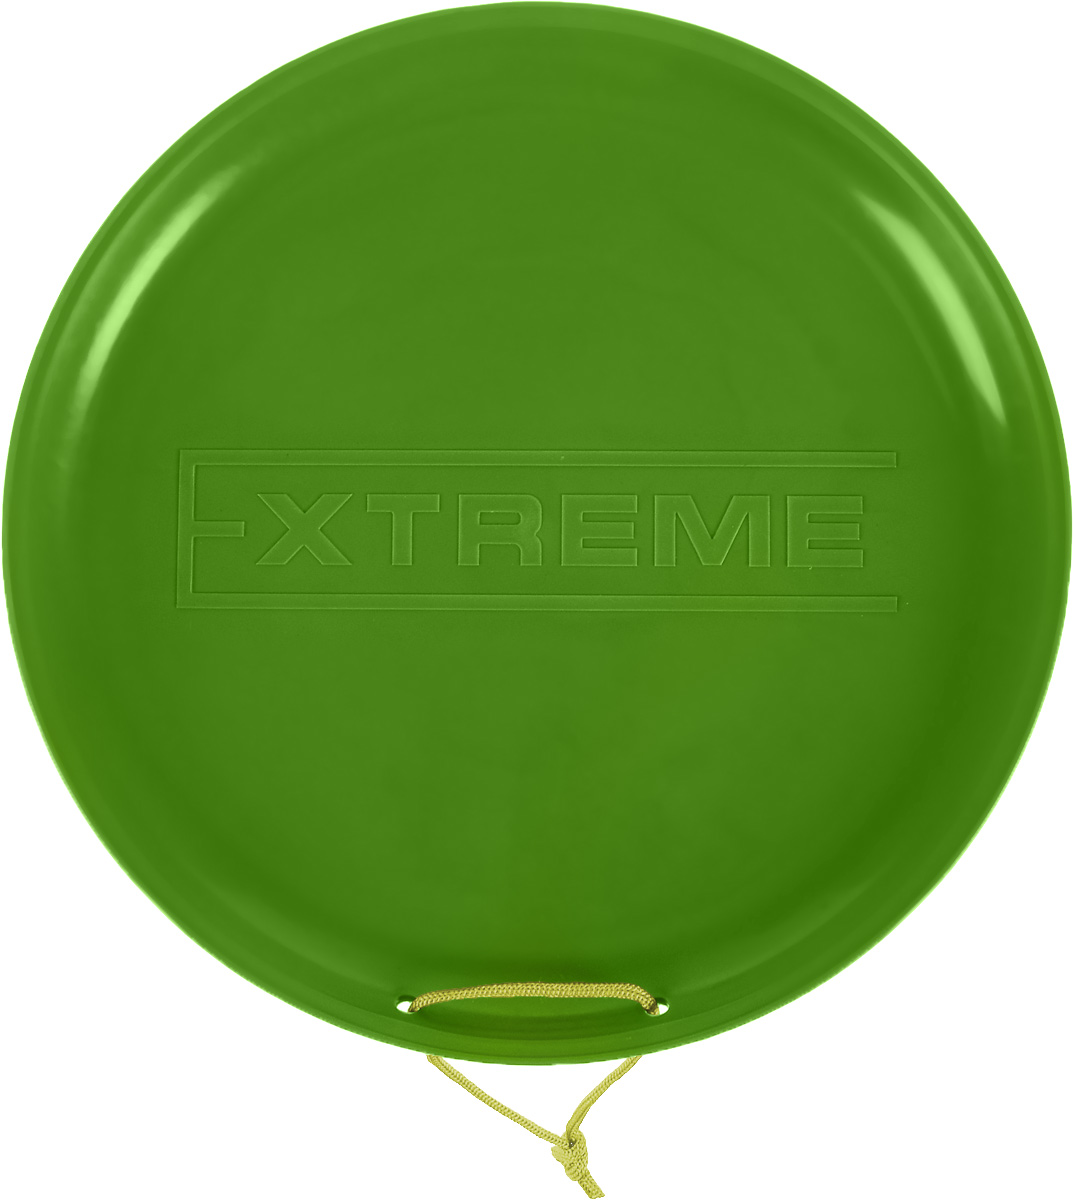 "Фото Санки-ледянки Престиж ""Экстрим"", цвет: зеленый, диаметр 40 см"